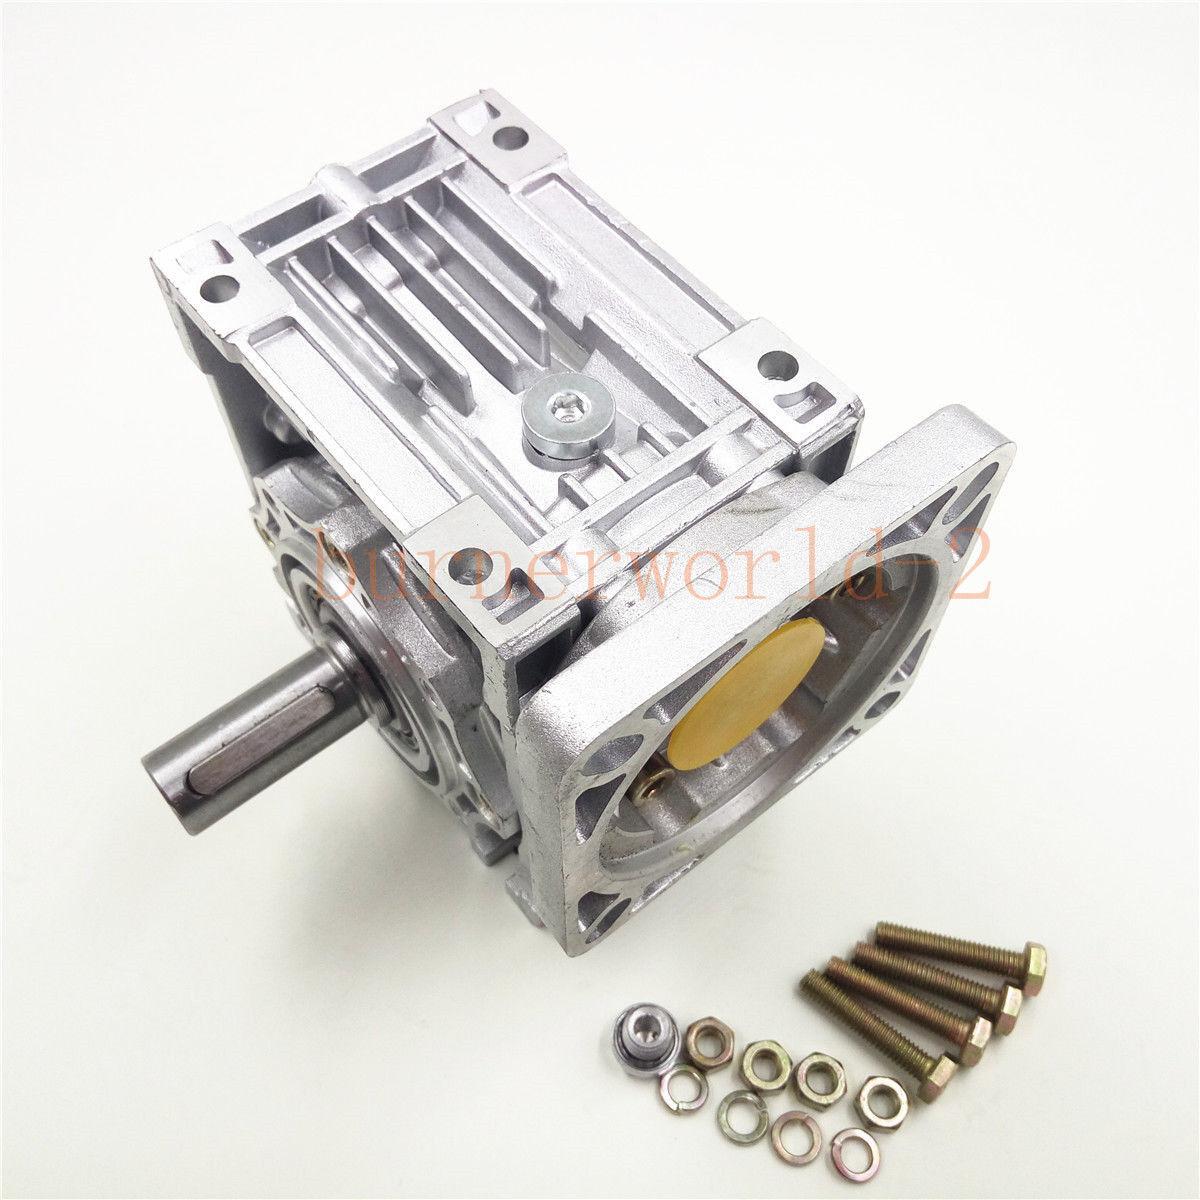 040 Ratio 63B14 100:1 Worm Gear Speed Reducer 11mm 1400r//min for Stepper Motor